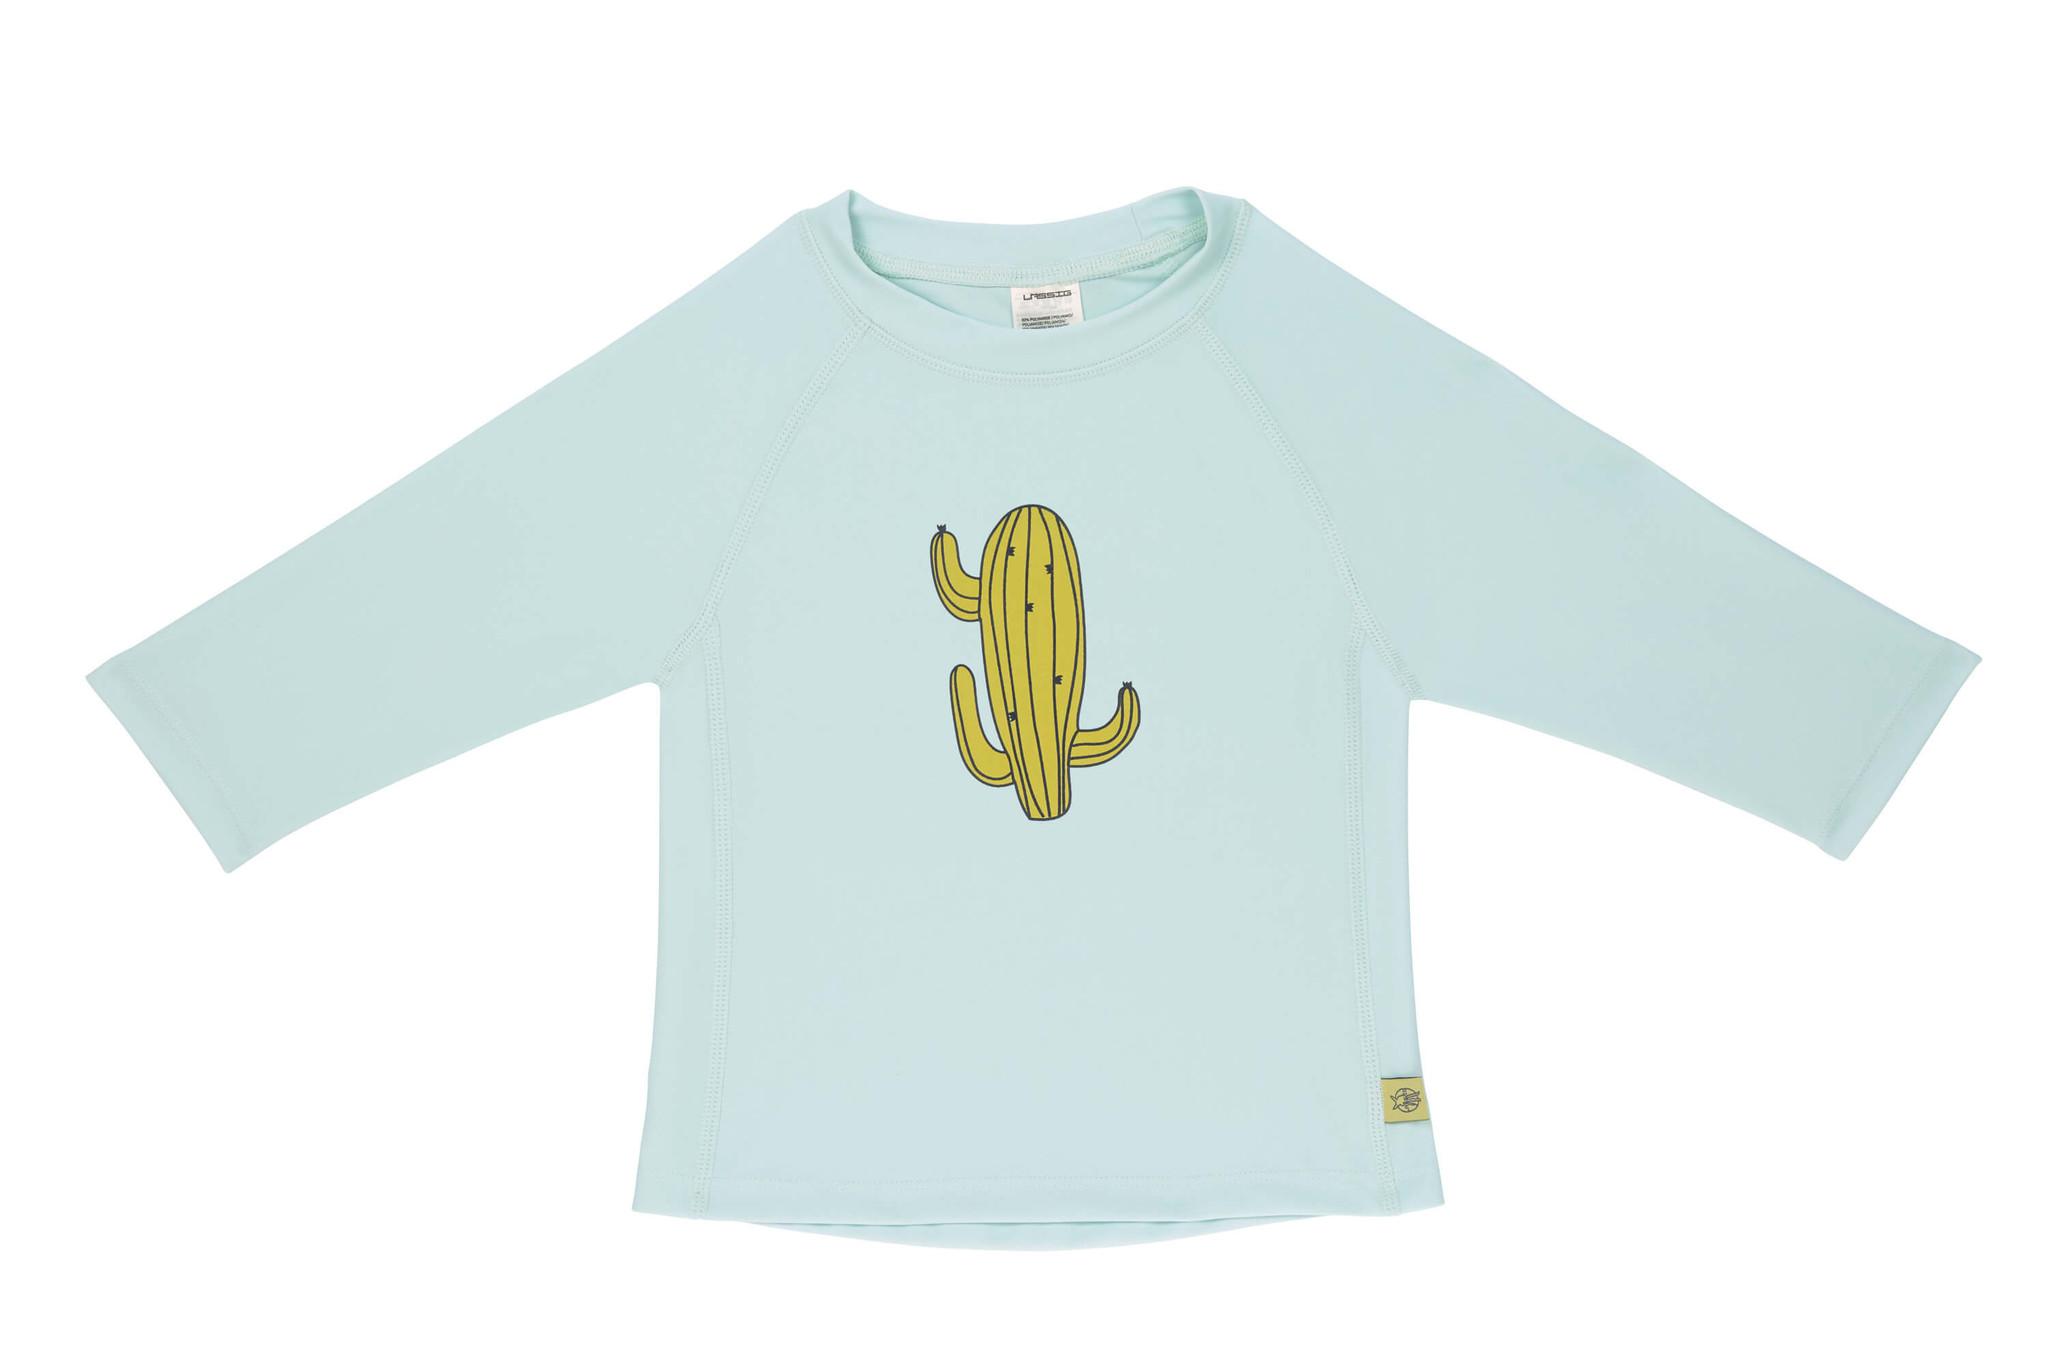 Lässig Splash & Fun Lange mouw Rashguard / zwemshirt - Cactus Family